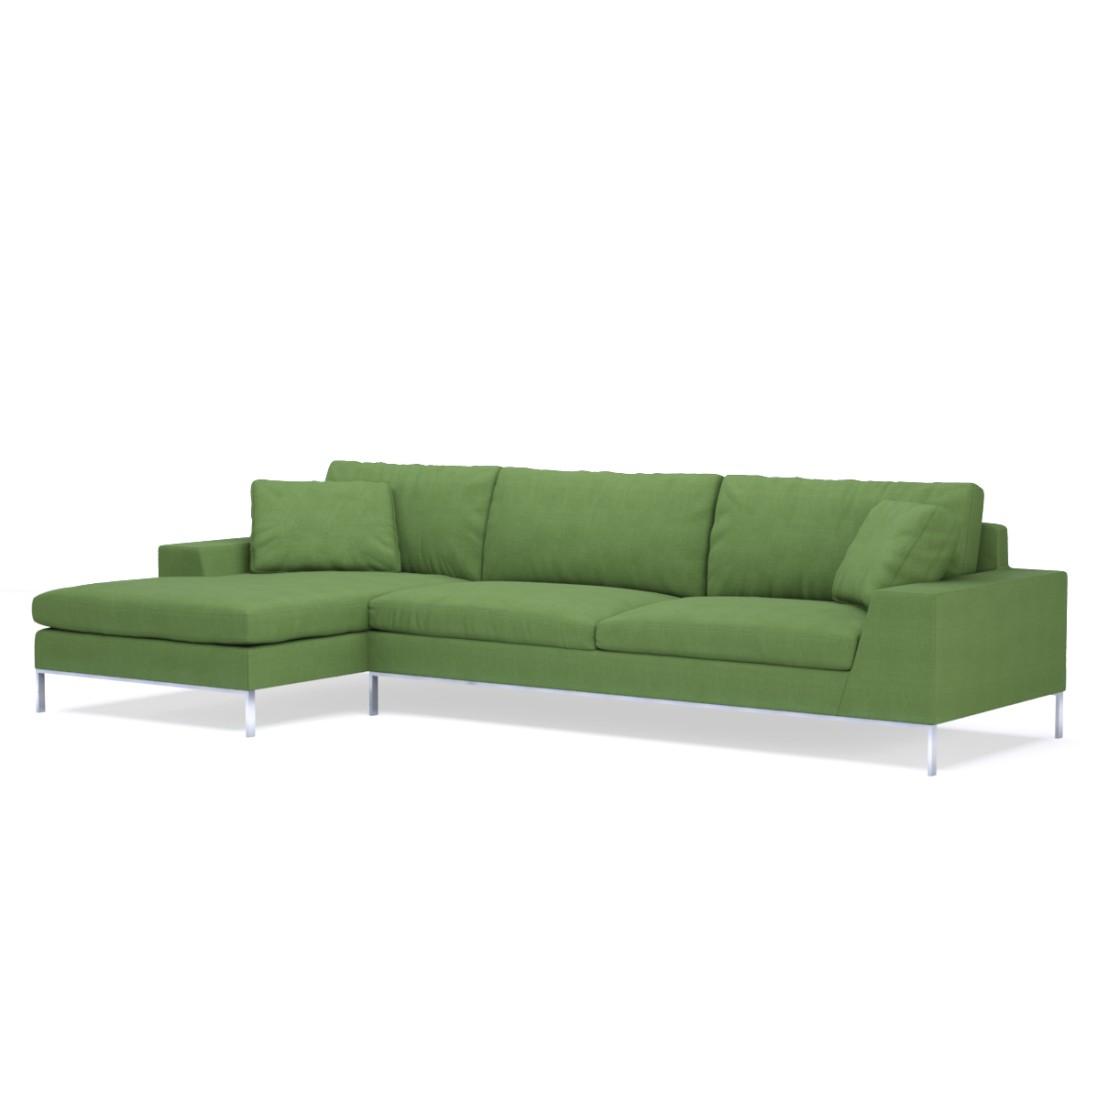 sofa mit ottomane links home design inspiration und. Black Bedroom Furniture Sets. Home Design Ideas